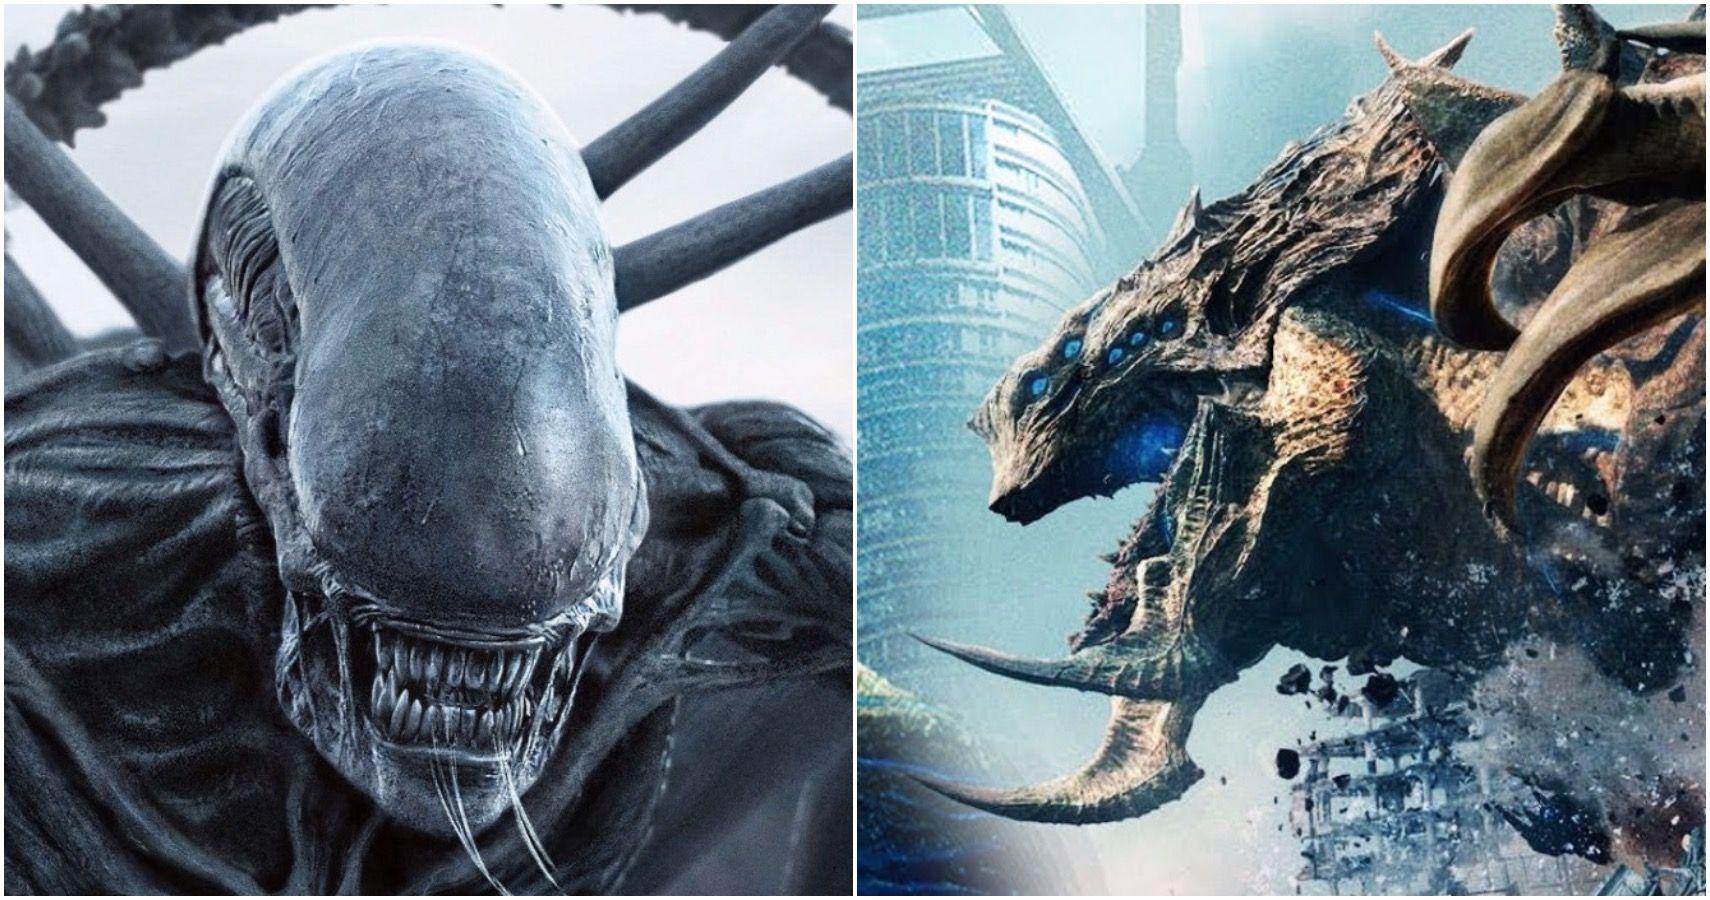 Sci-fi & Horror cover image